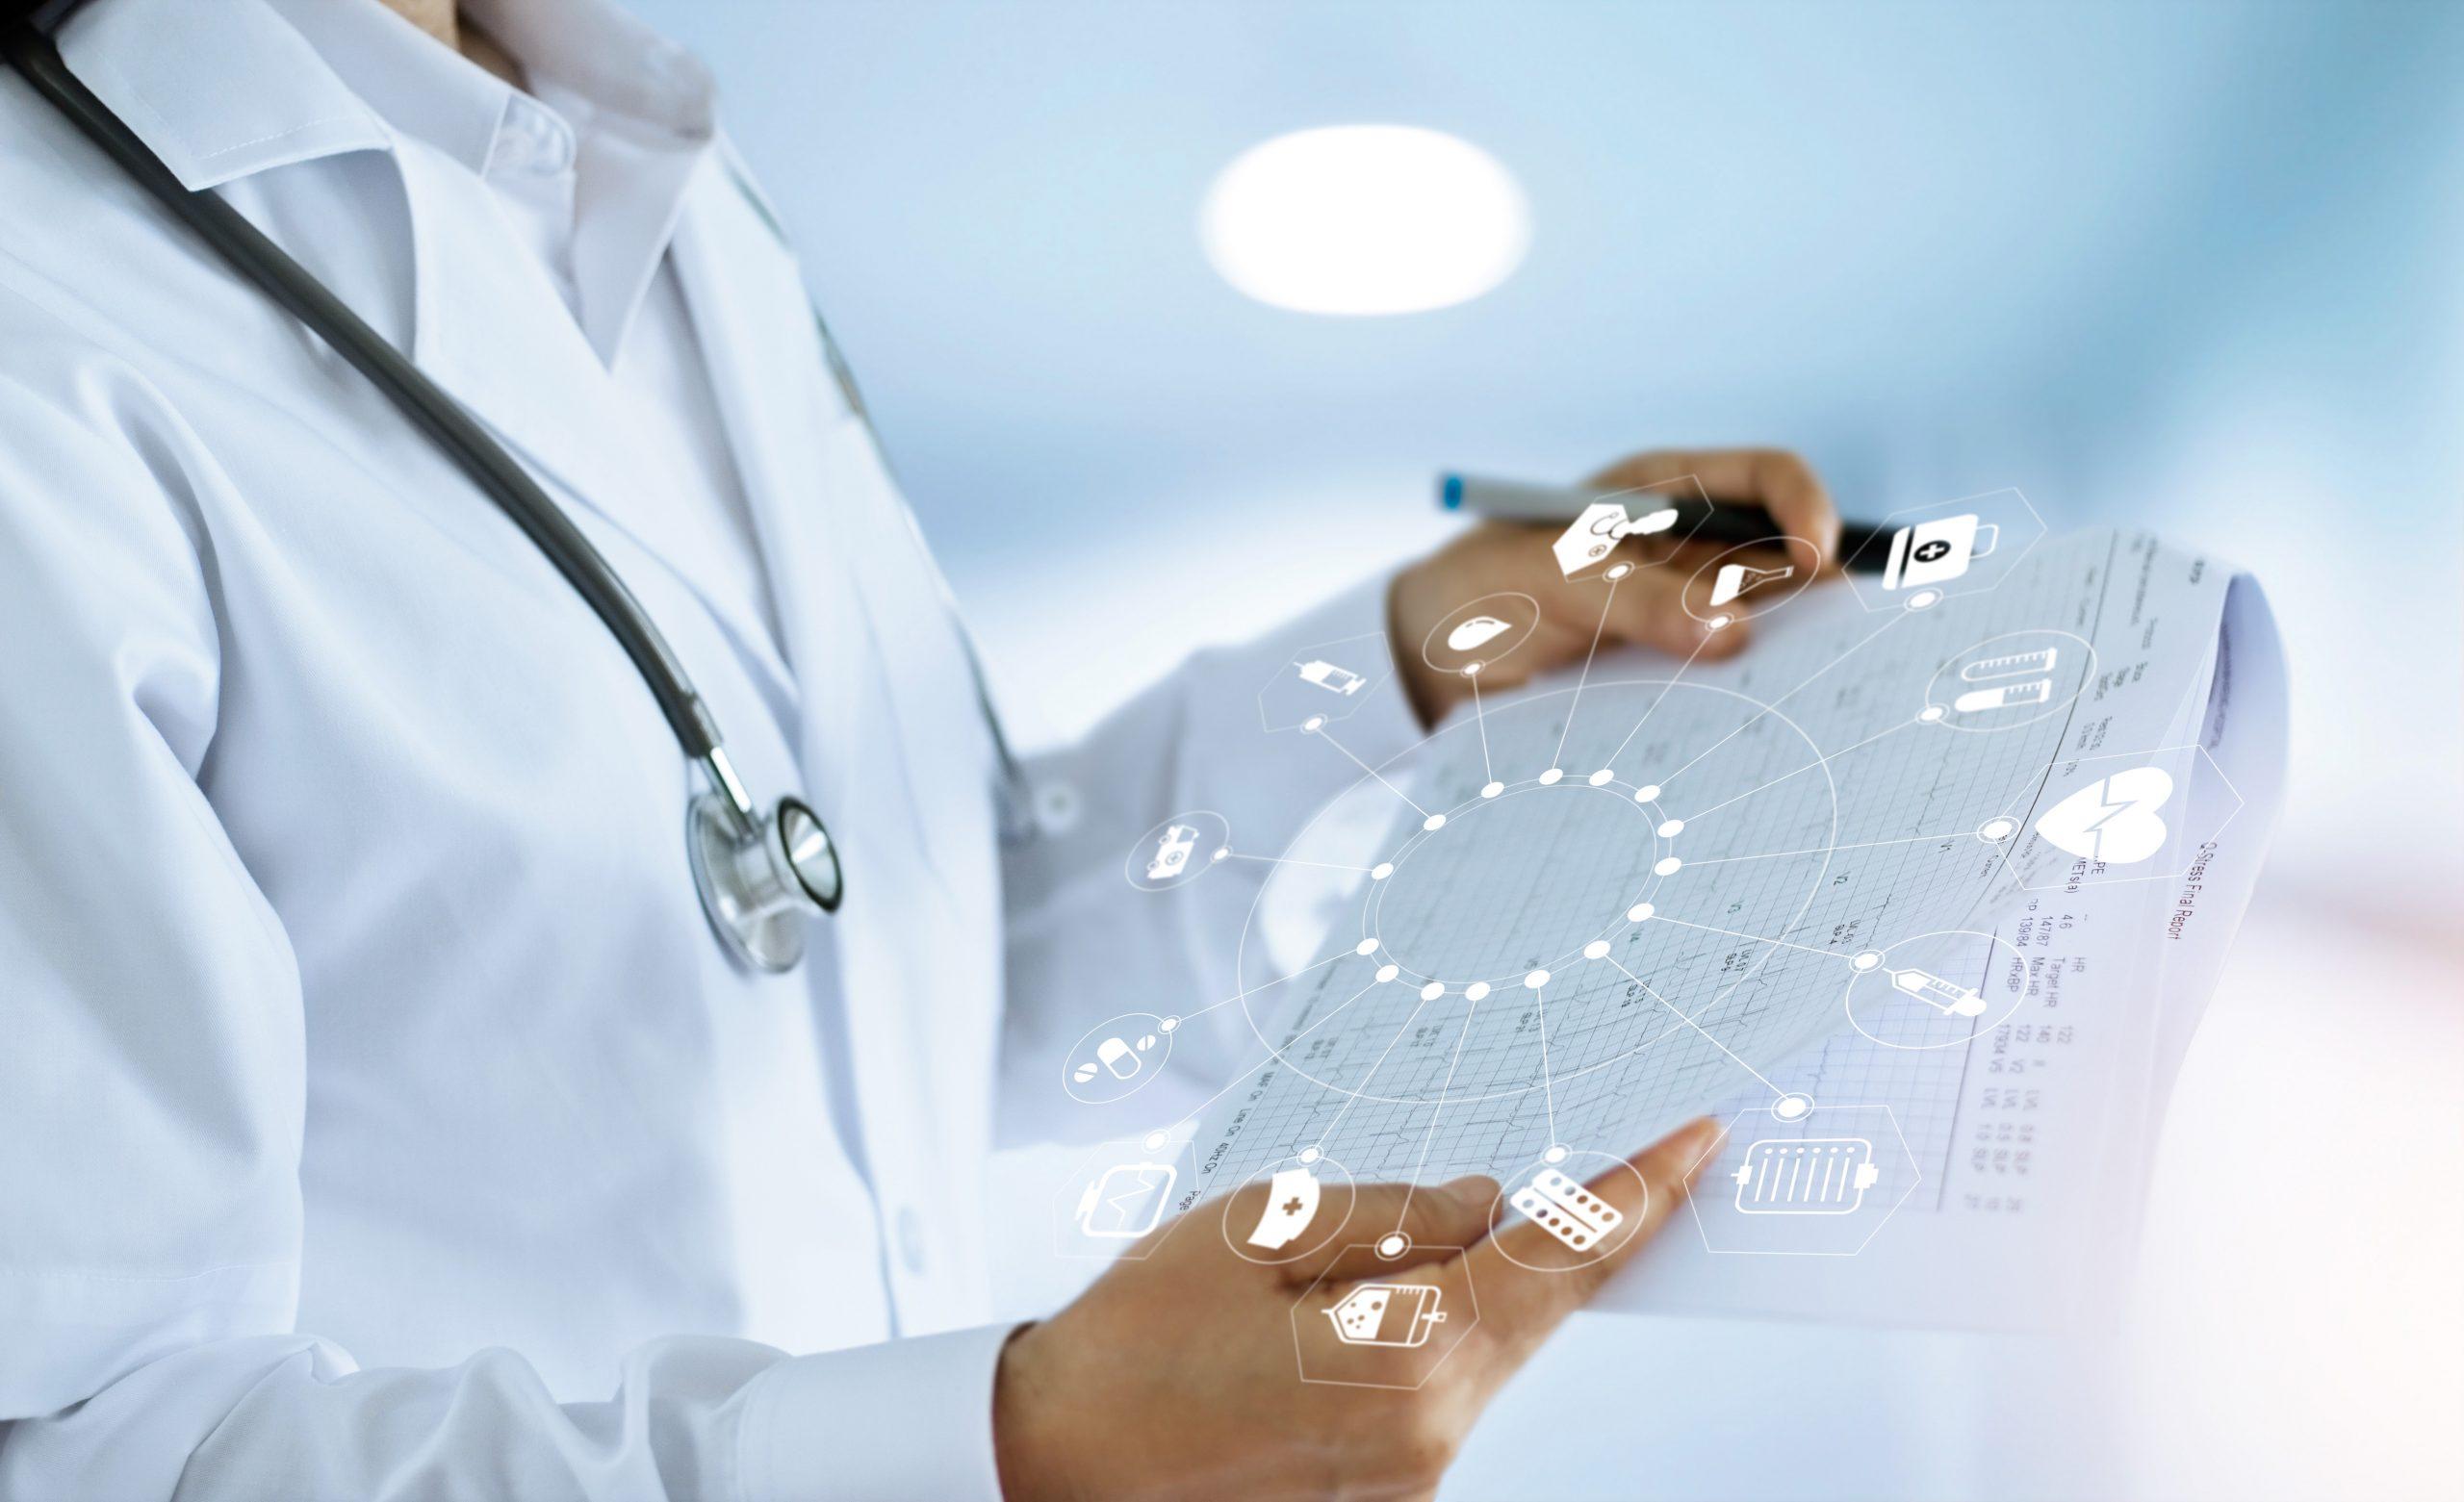 dr pop md medicine diabetes 181